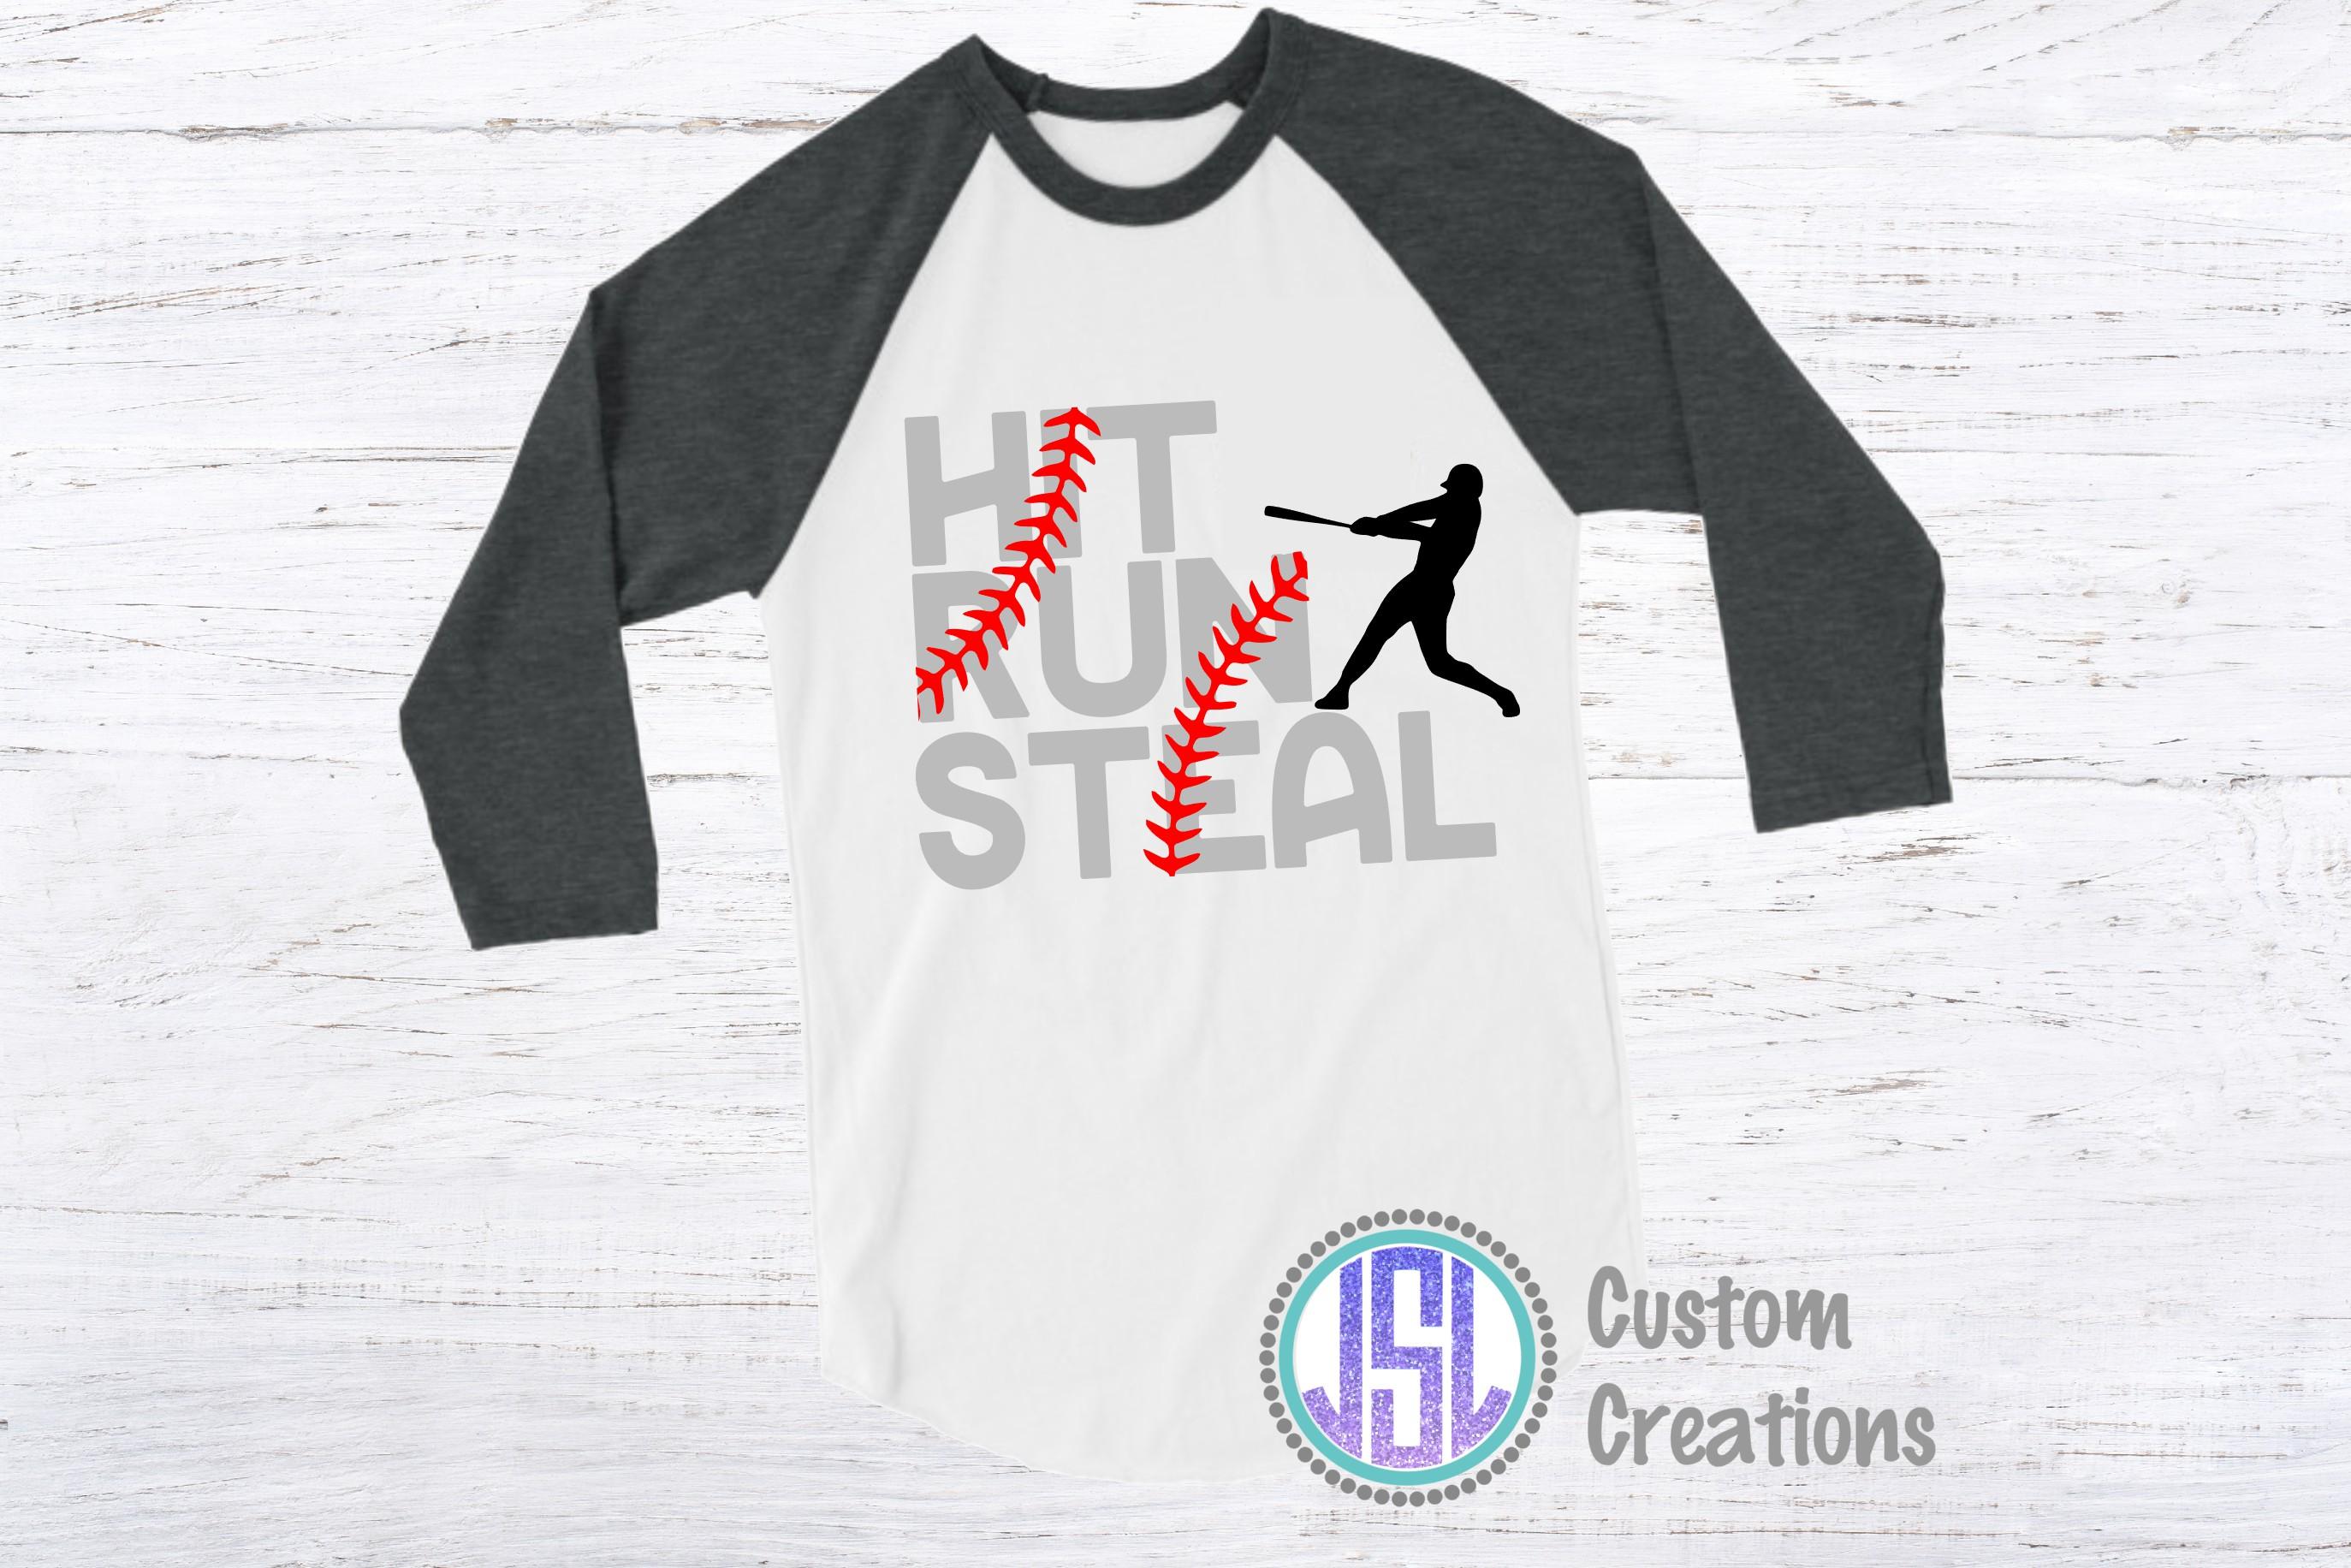 Hit Run Steal   Set of 2 Baseball Bundle  SVG DXF EPS PNG example image 2